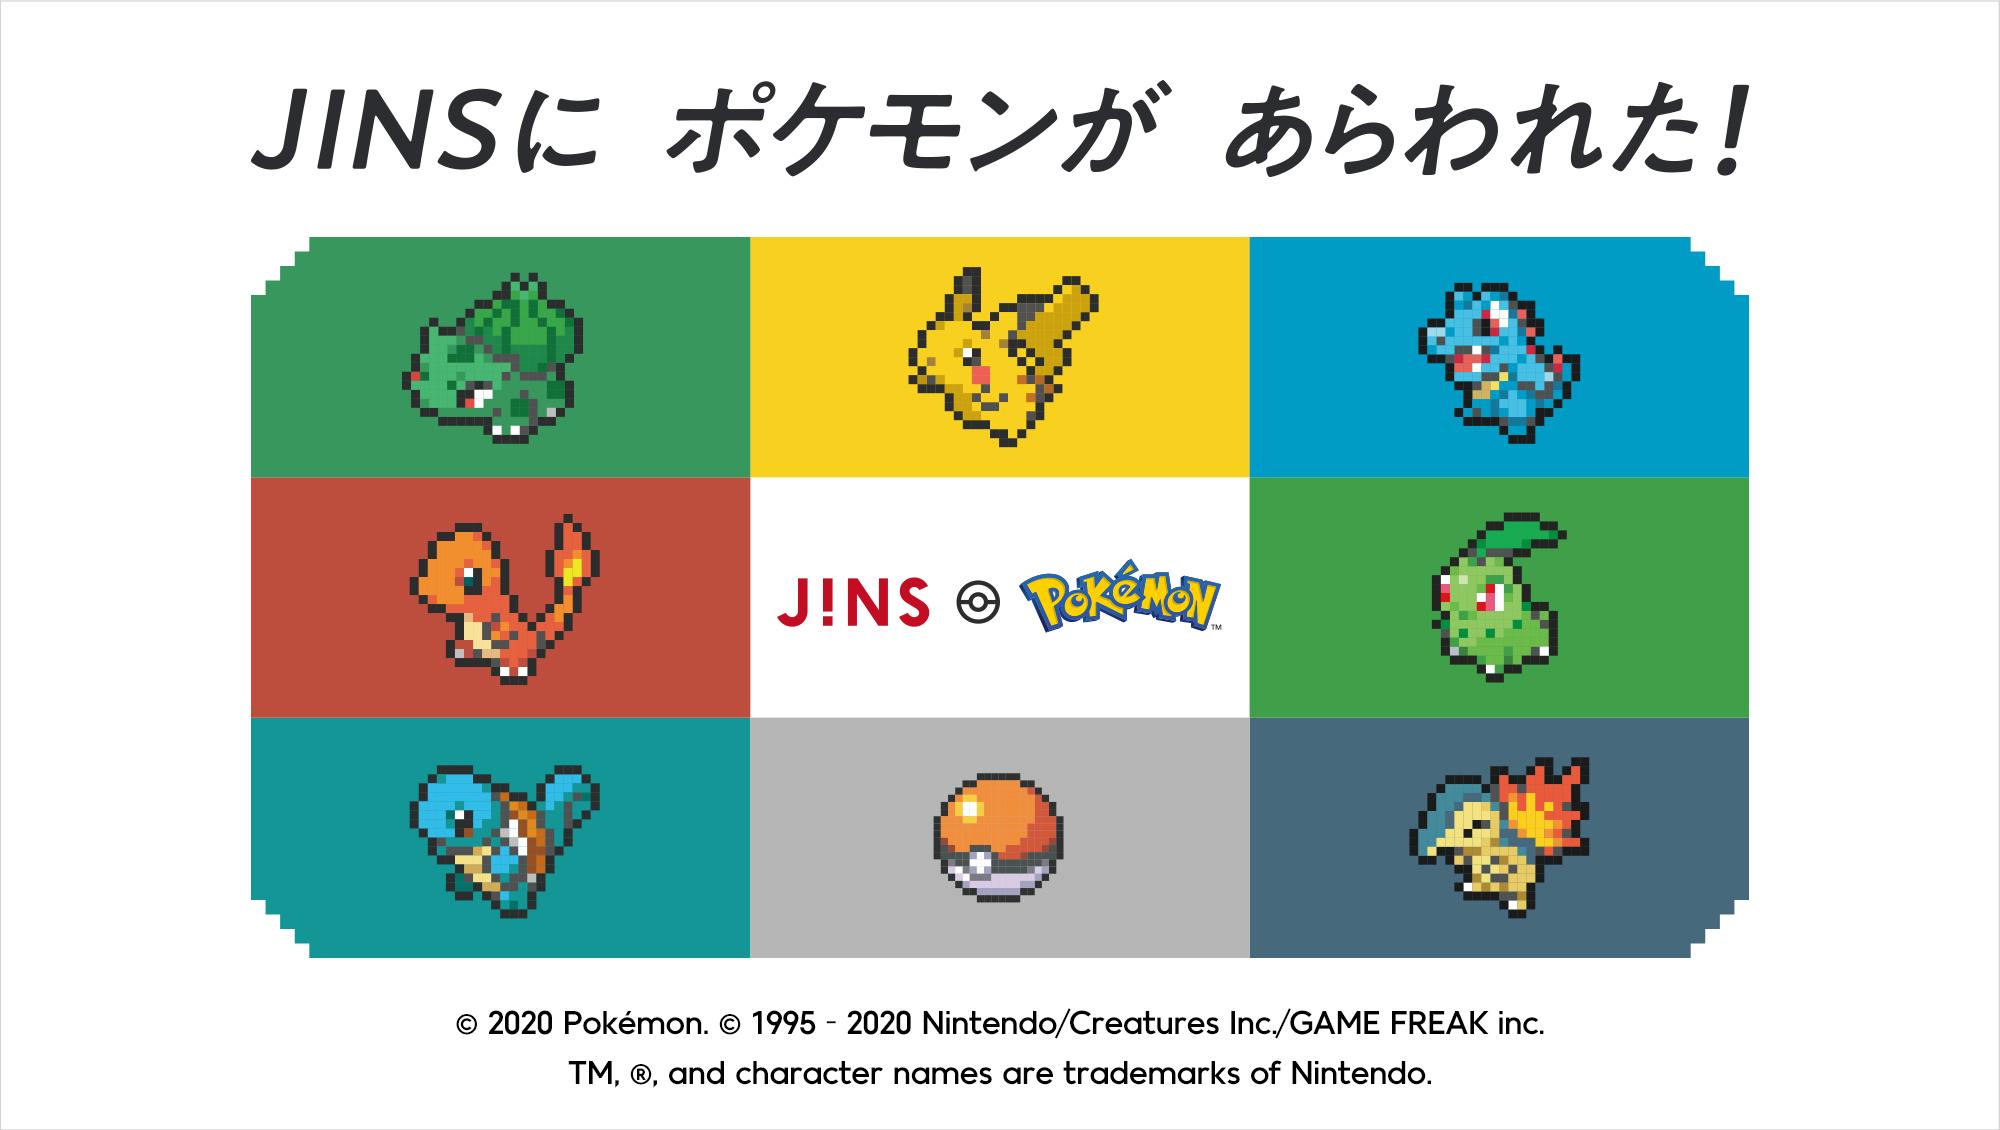 JINSポケモンモデルビジュアル